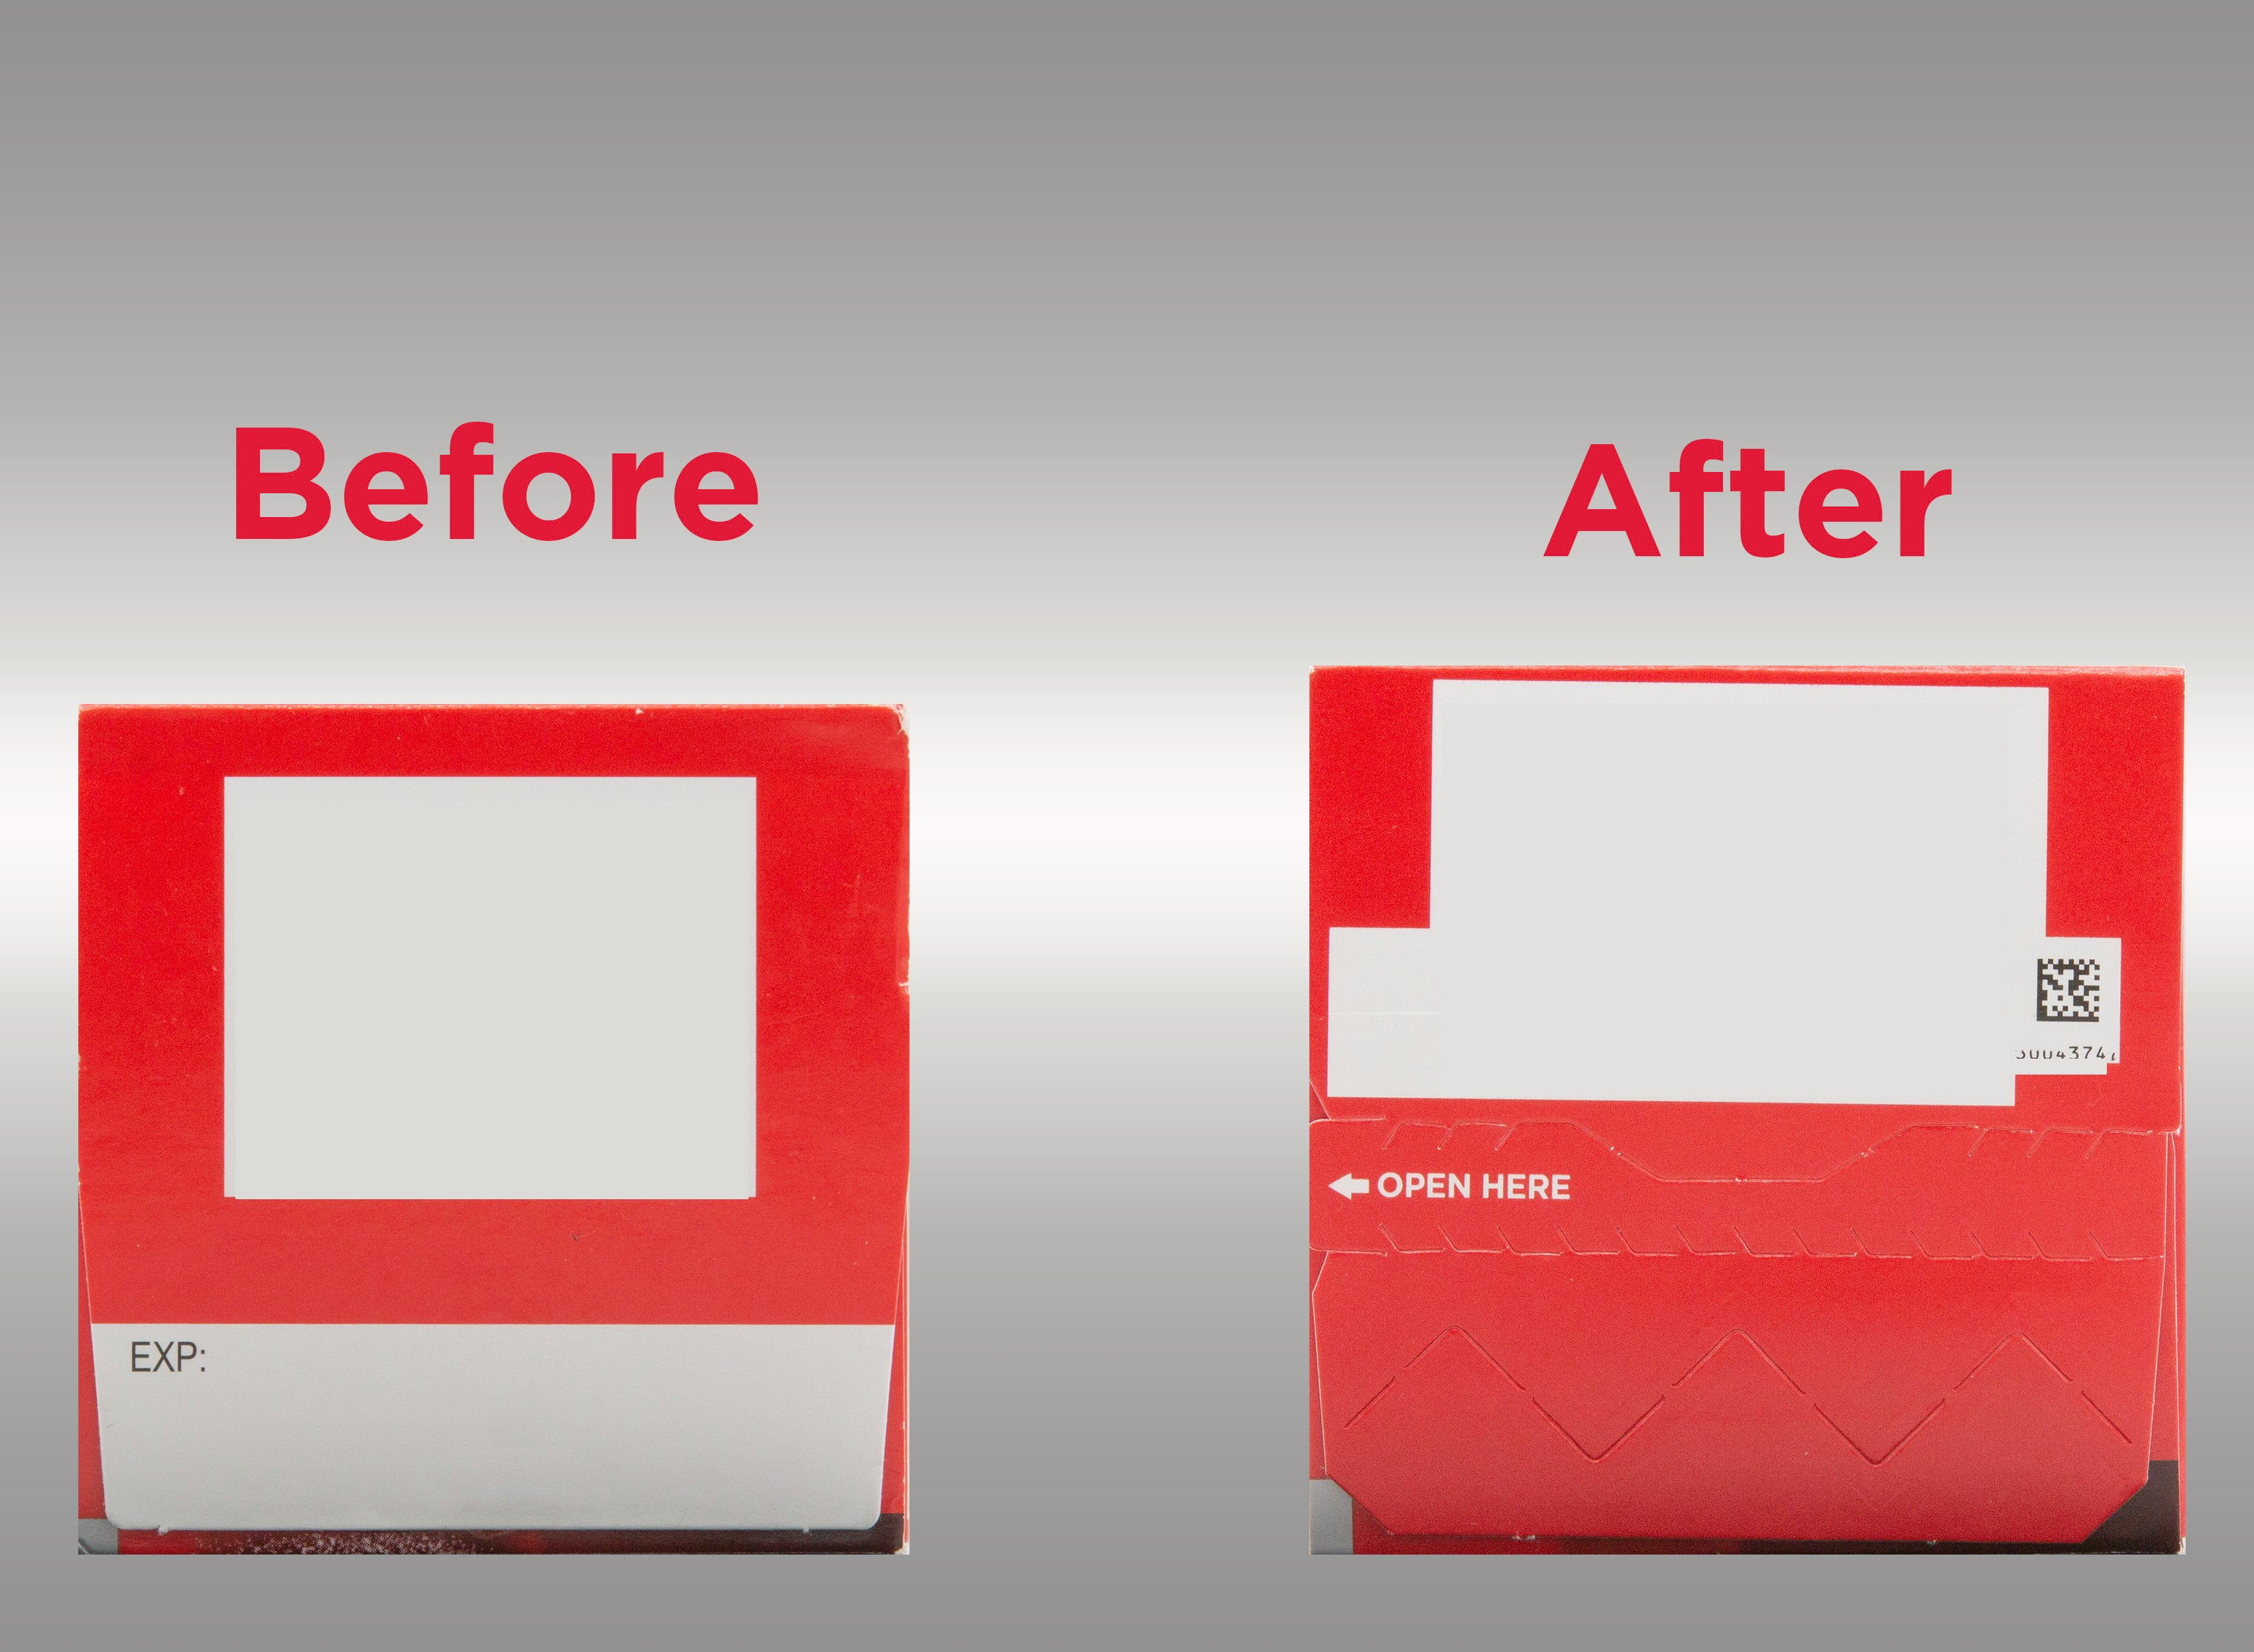 Old Tylenol carton vs new Tylenol carton